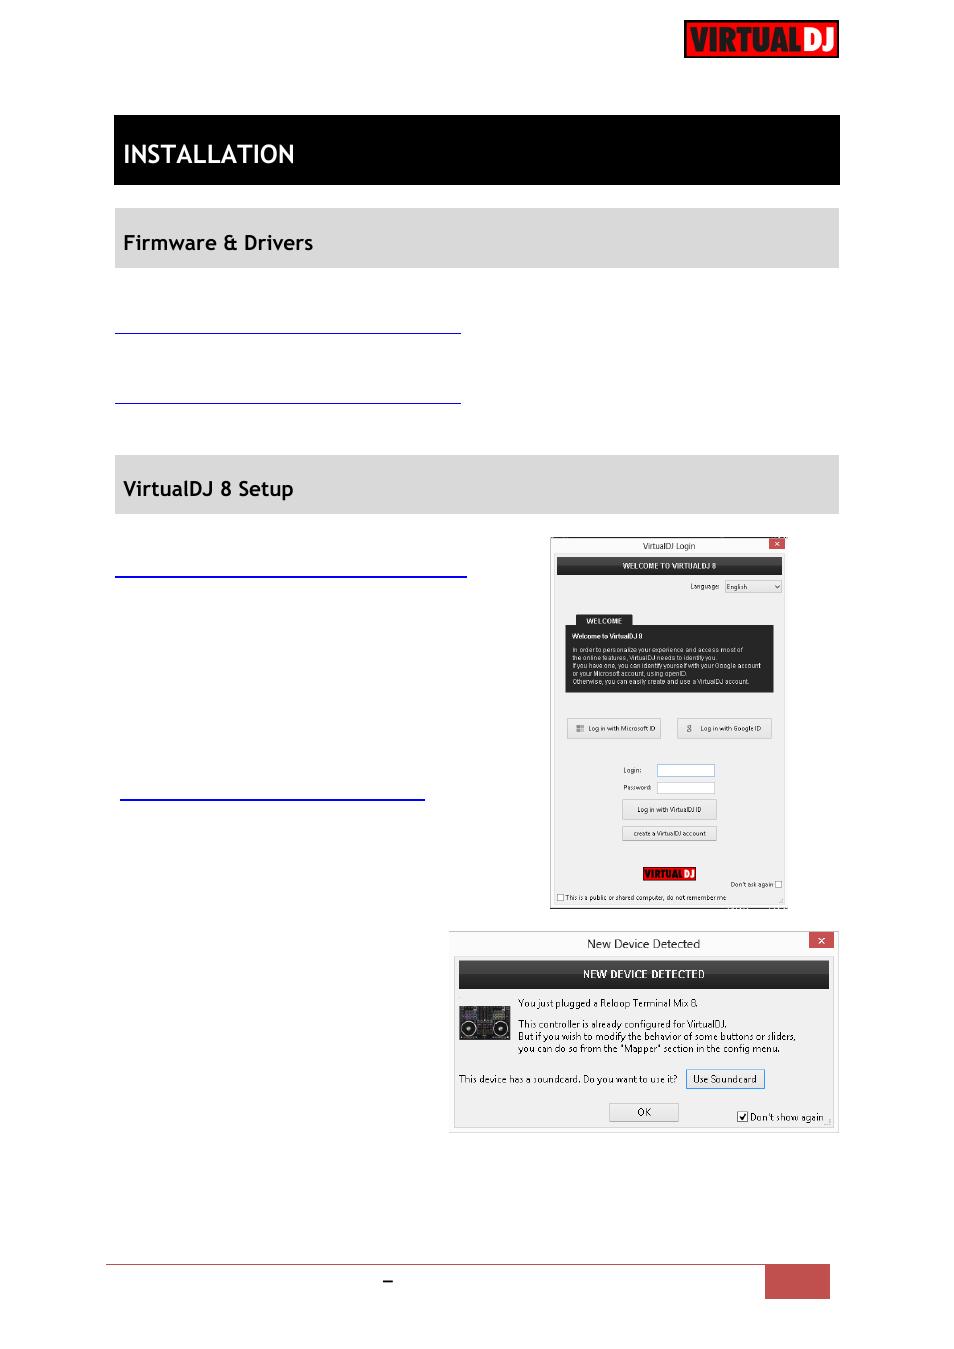 Installation, Firmware & drivers, Virtualdj 8 setup | Reloop